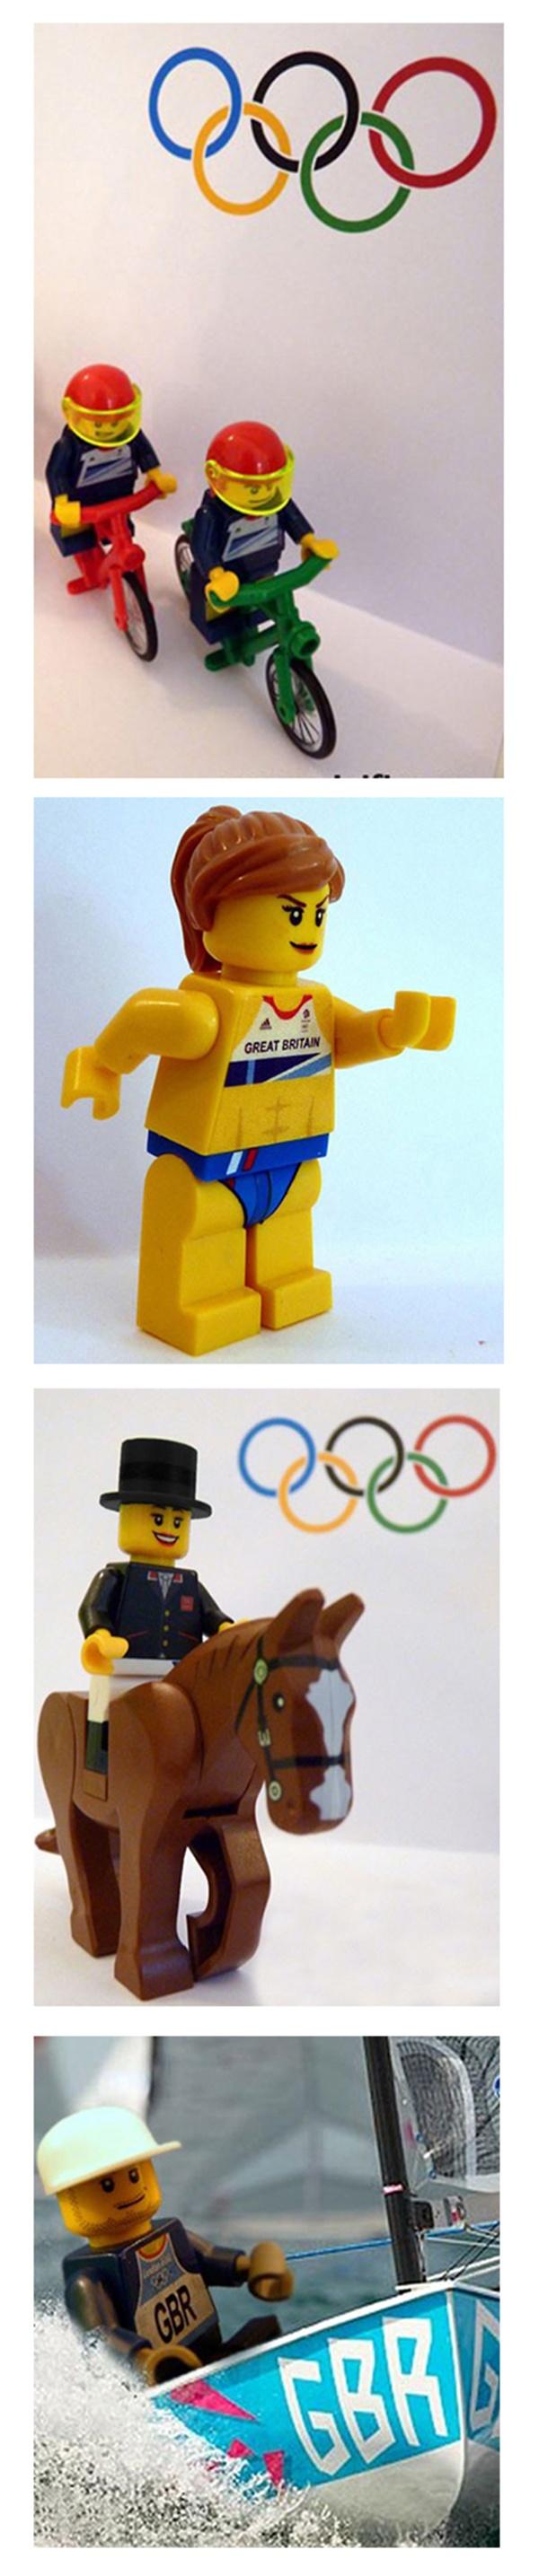 London 2012 Olympics: LEGO minifigs of Team GB gold medal winners